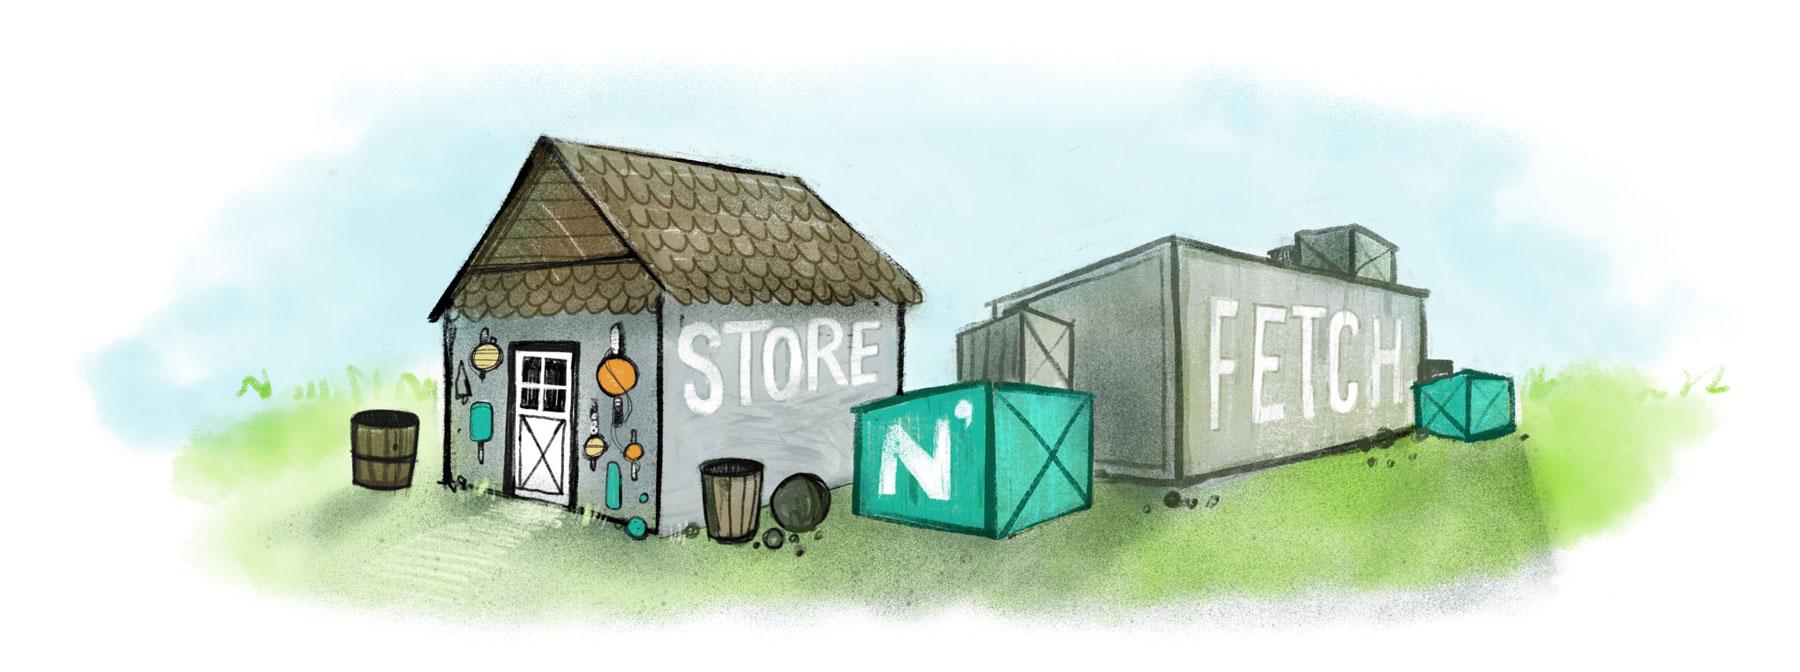 store-n-fetch-feature.jpg